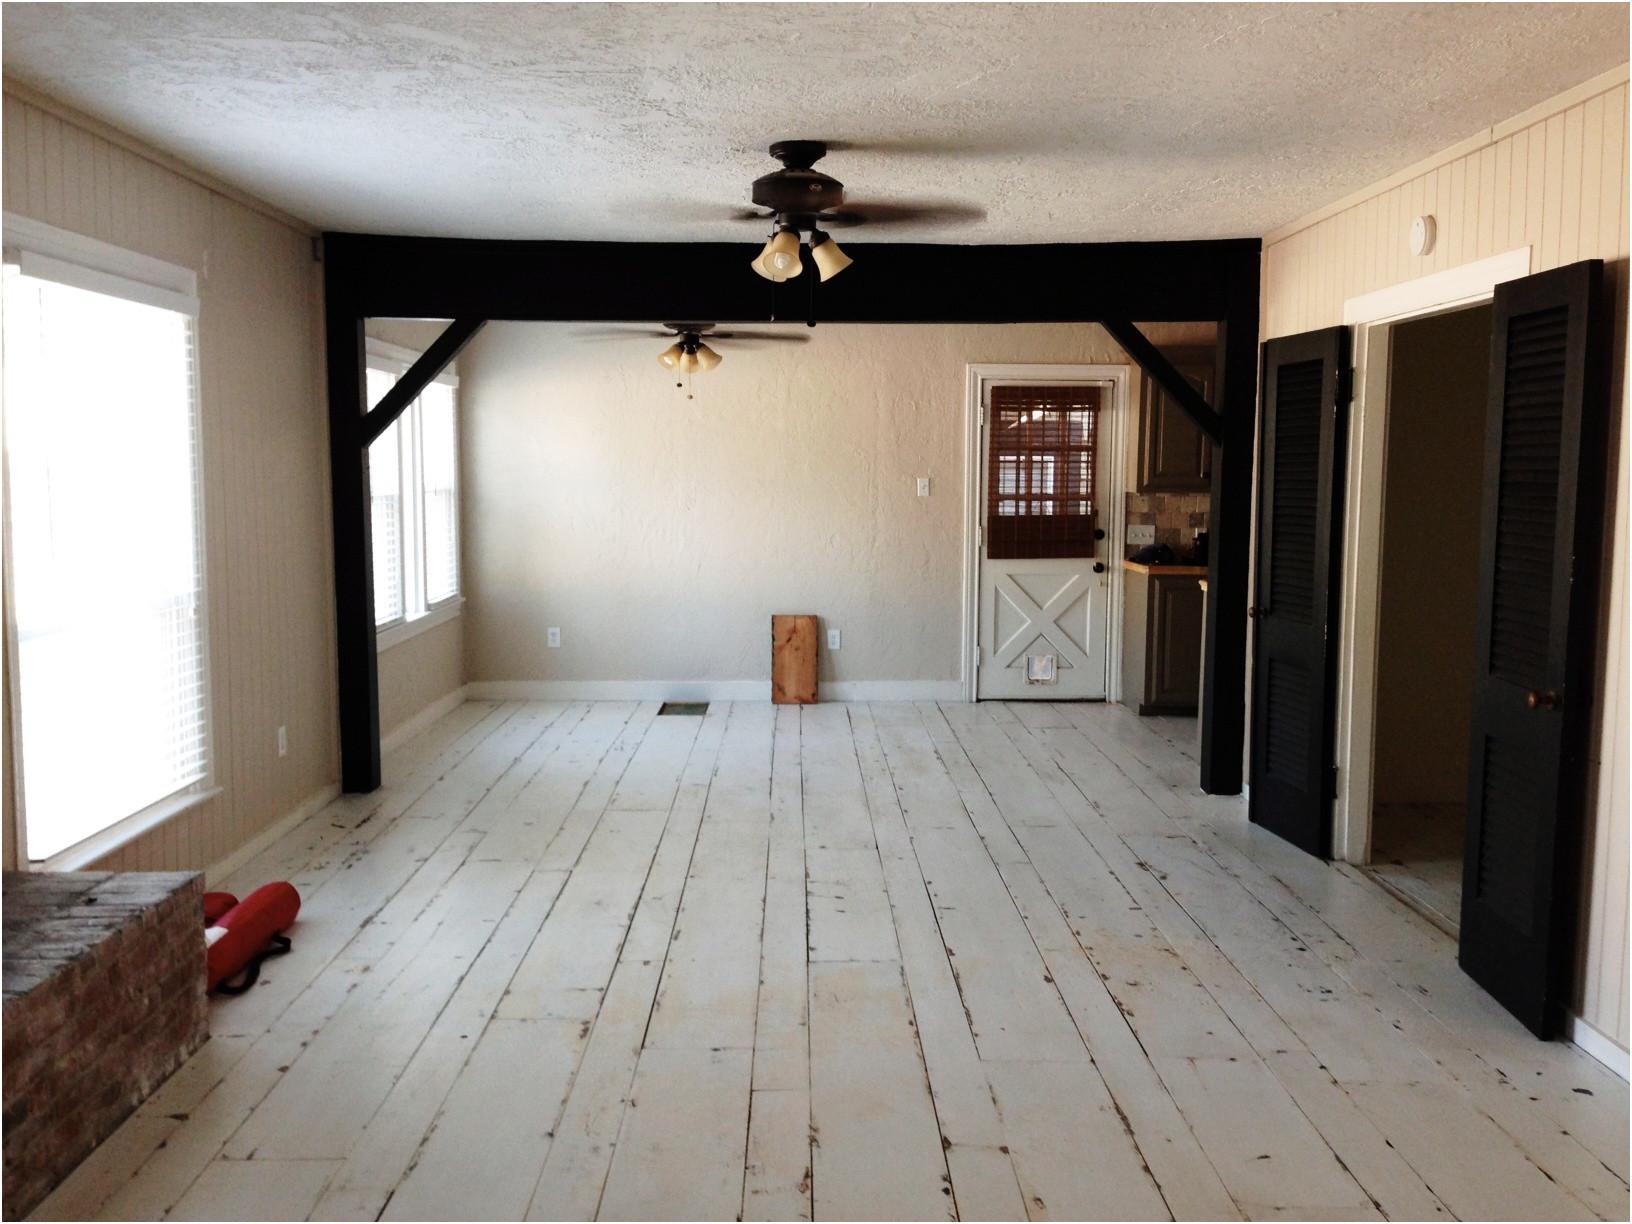 hardwood floor colors home depot of wood flooring ideas for living room elegant living room wall colors regarding post